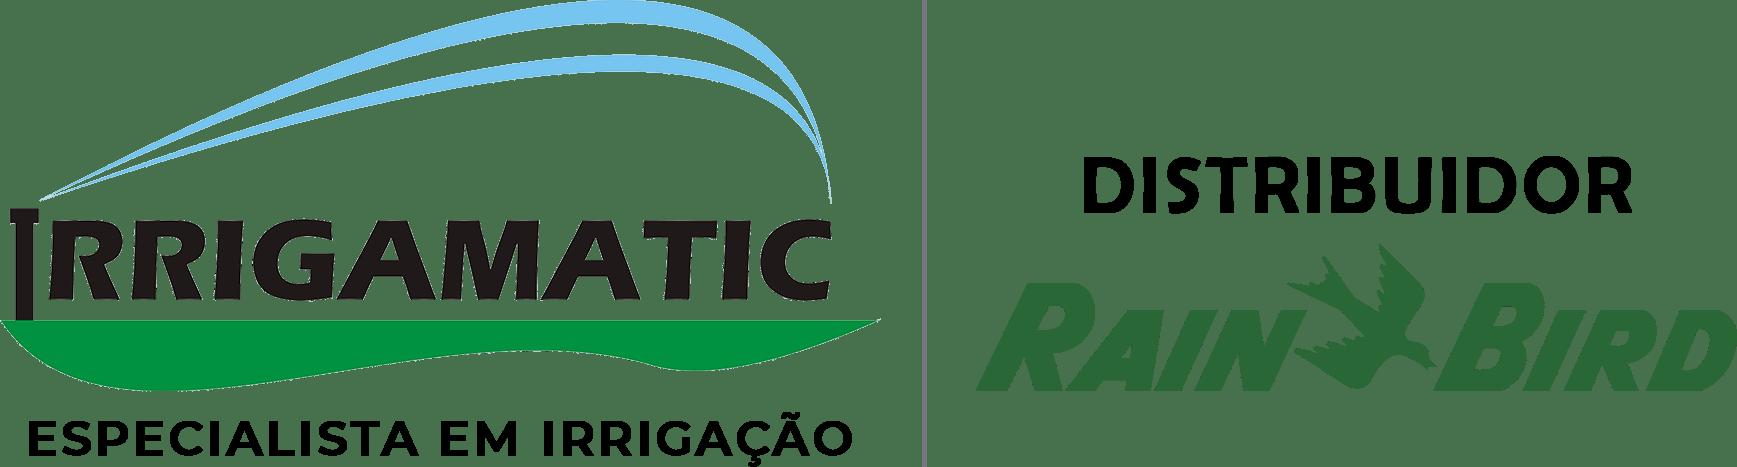 IrrigaMatic